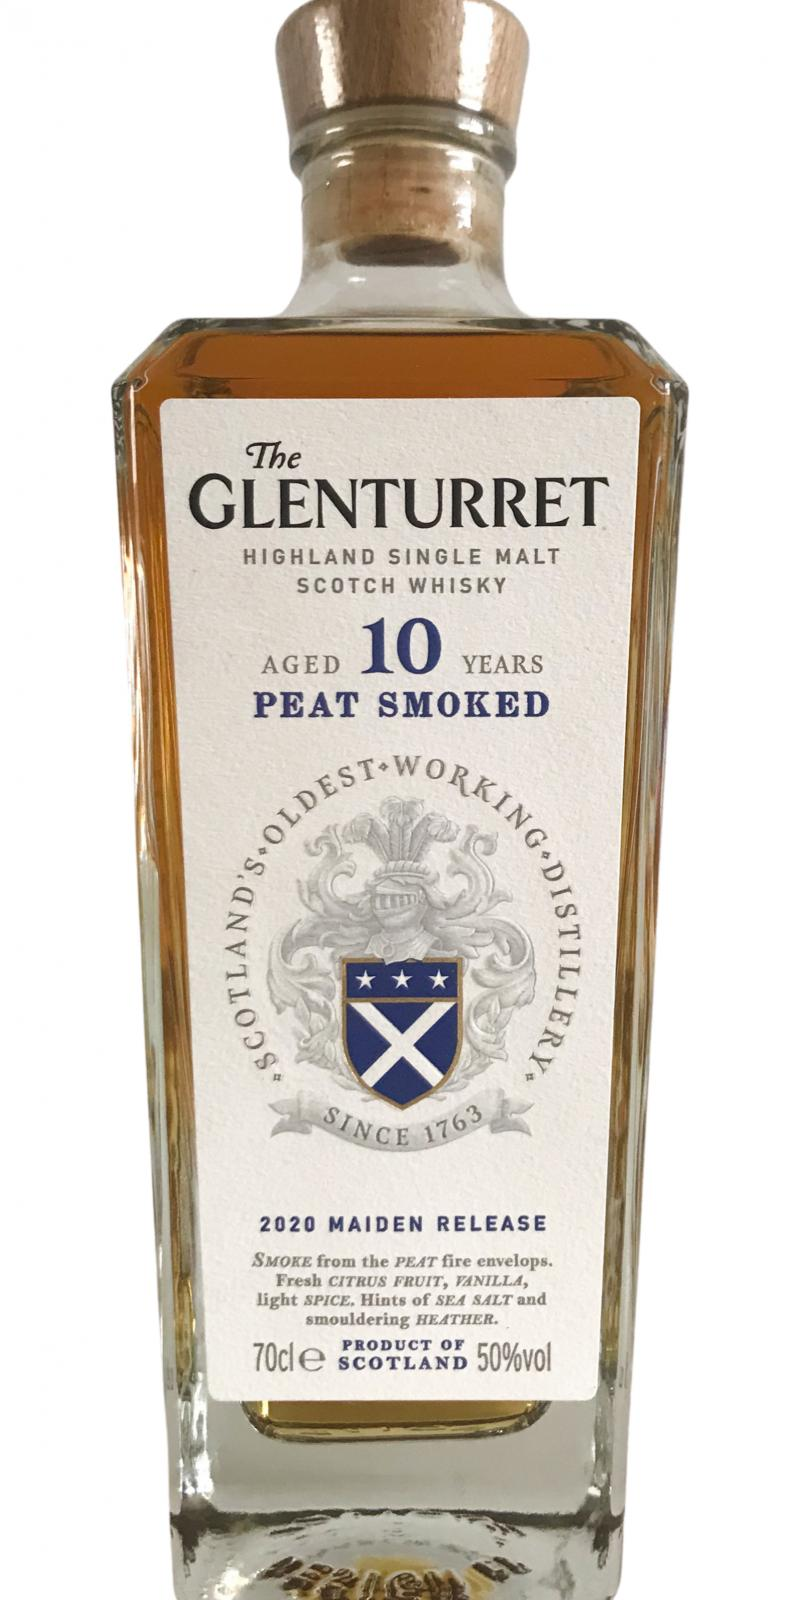 Glenturret 10-year-old - Peat Smoked